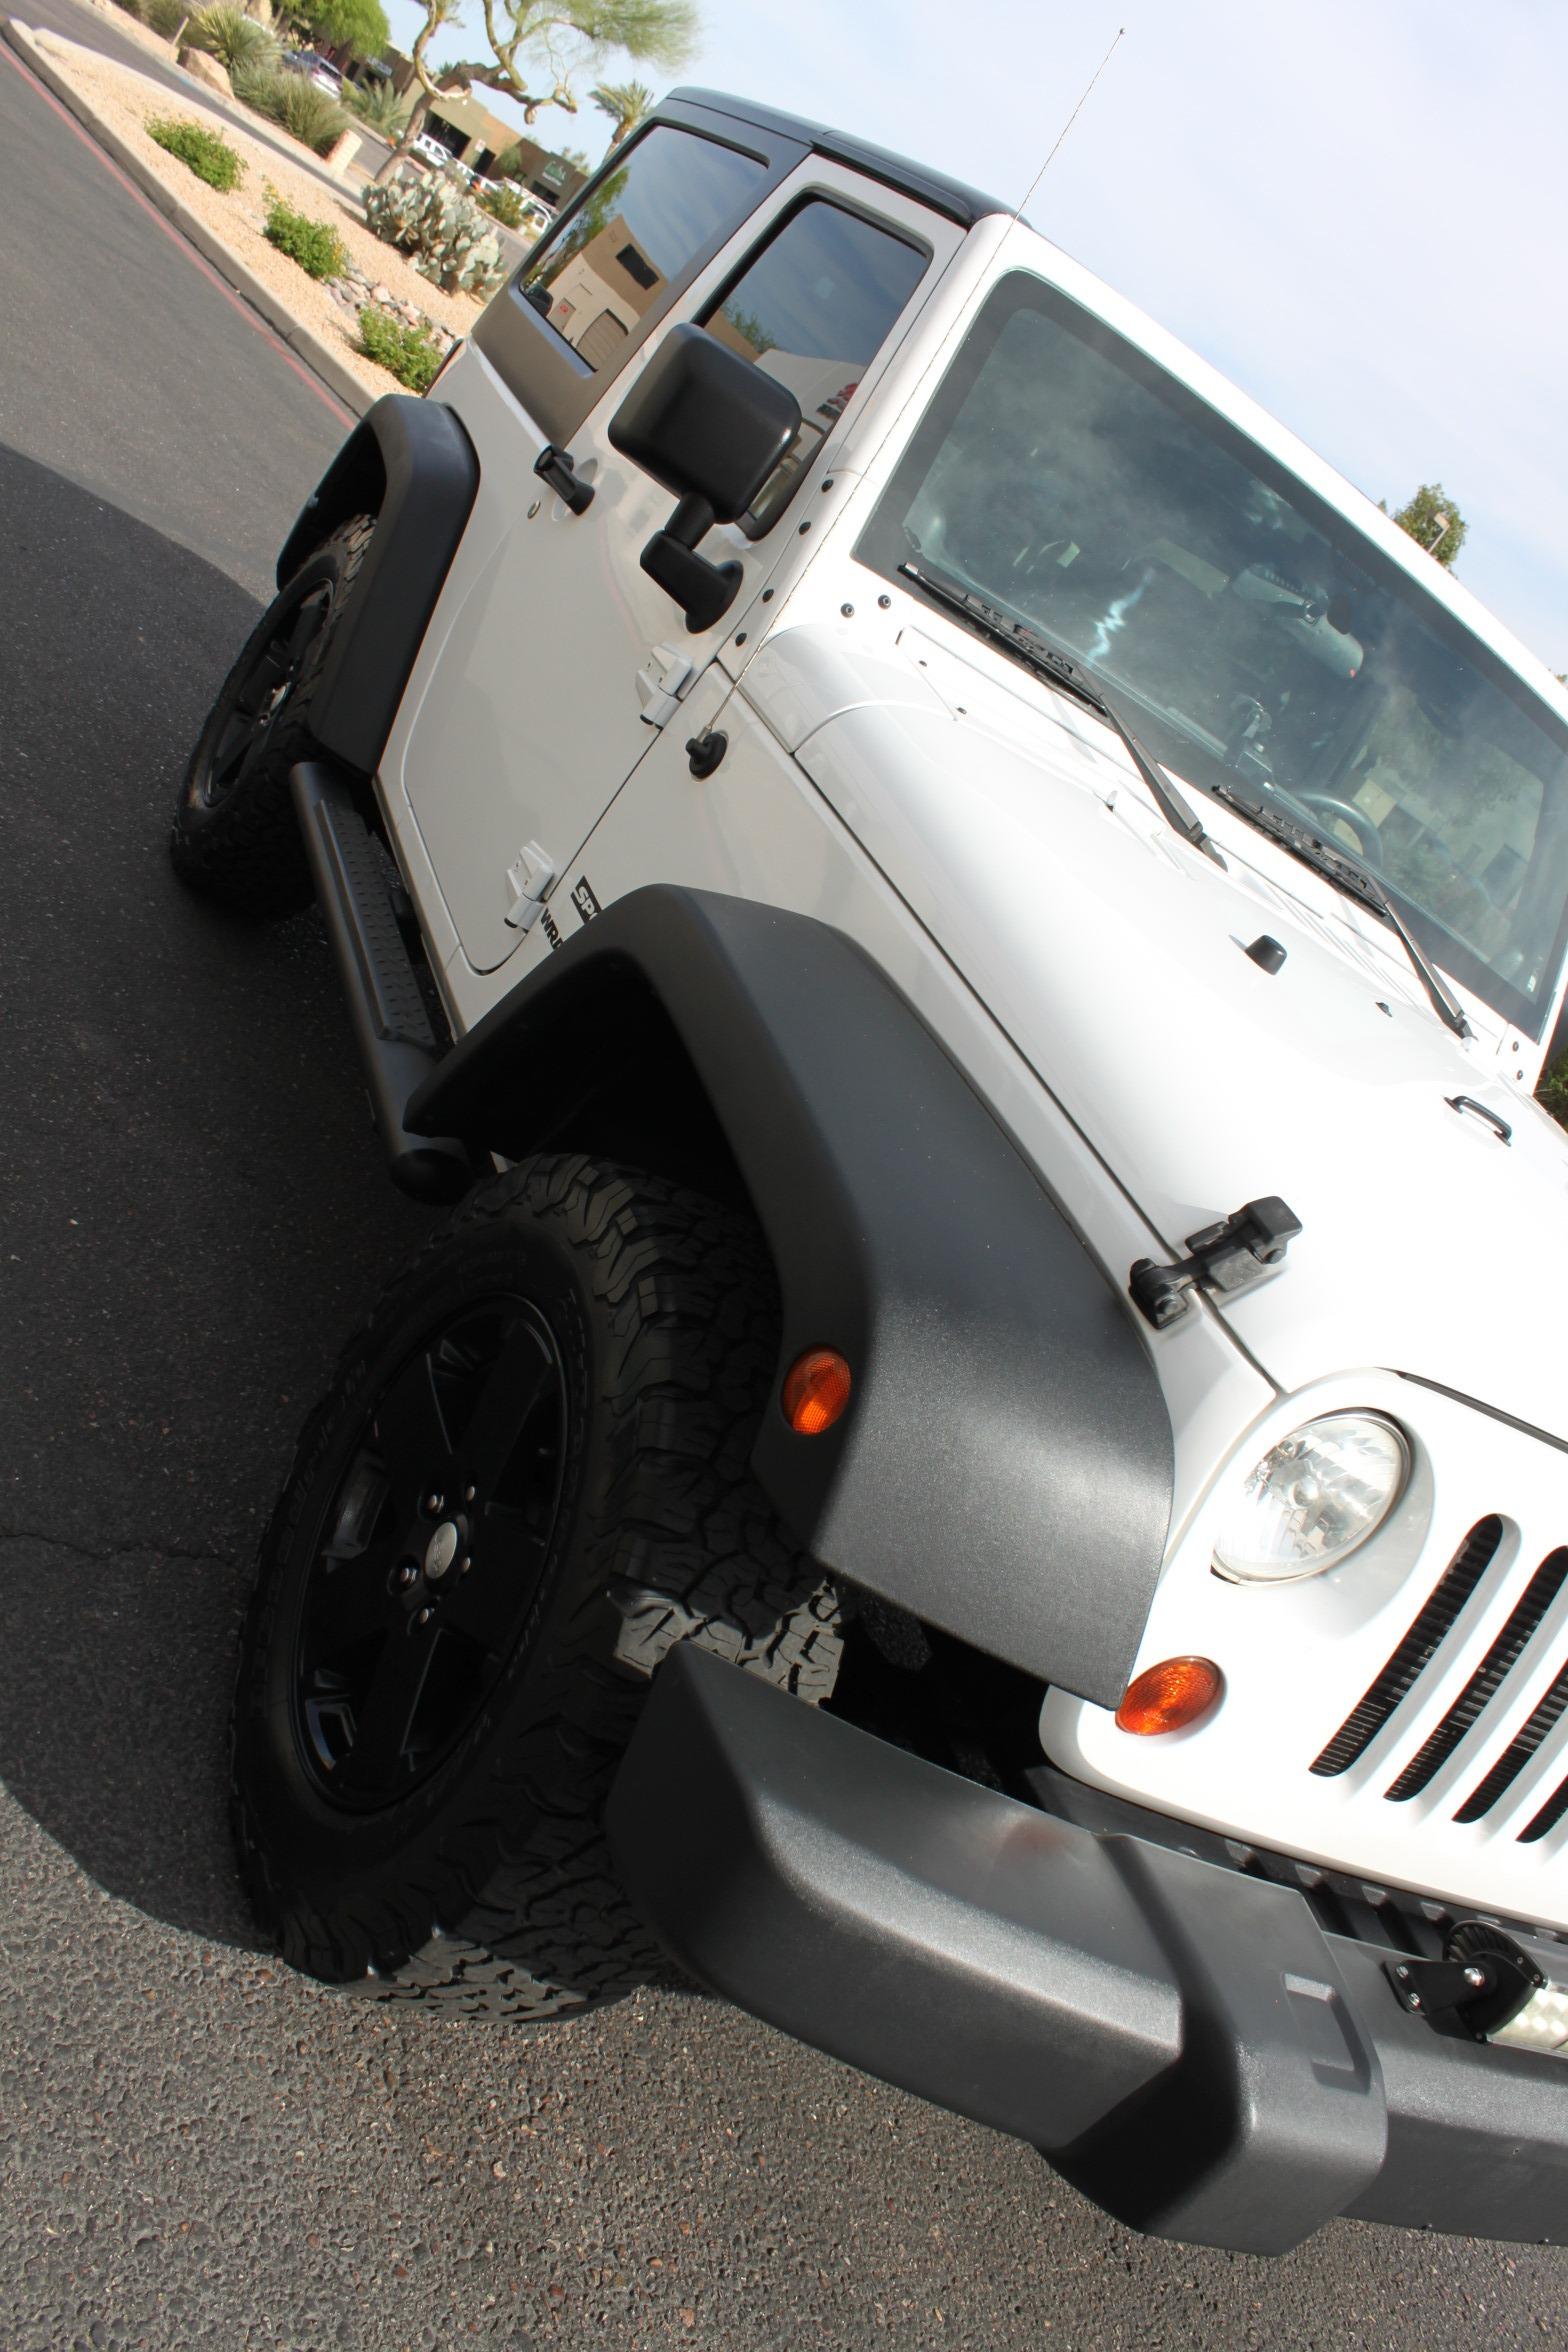 Used-2012-Jeep-Wrangler-Freedom-Edition-4X4-Cherokee